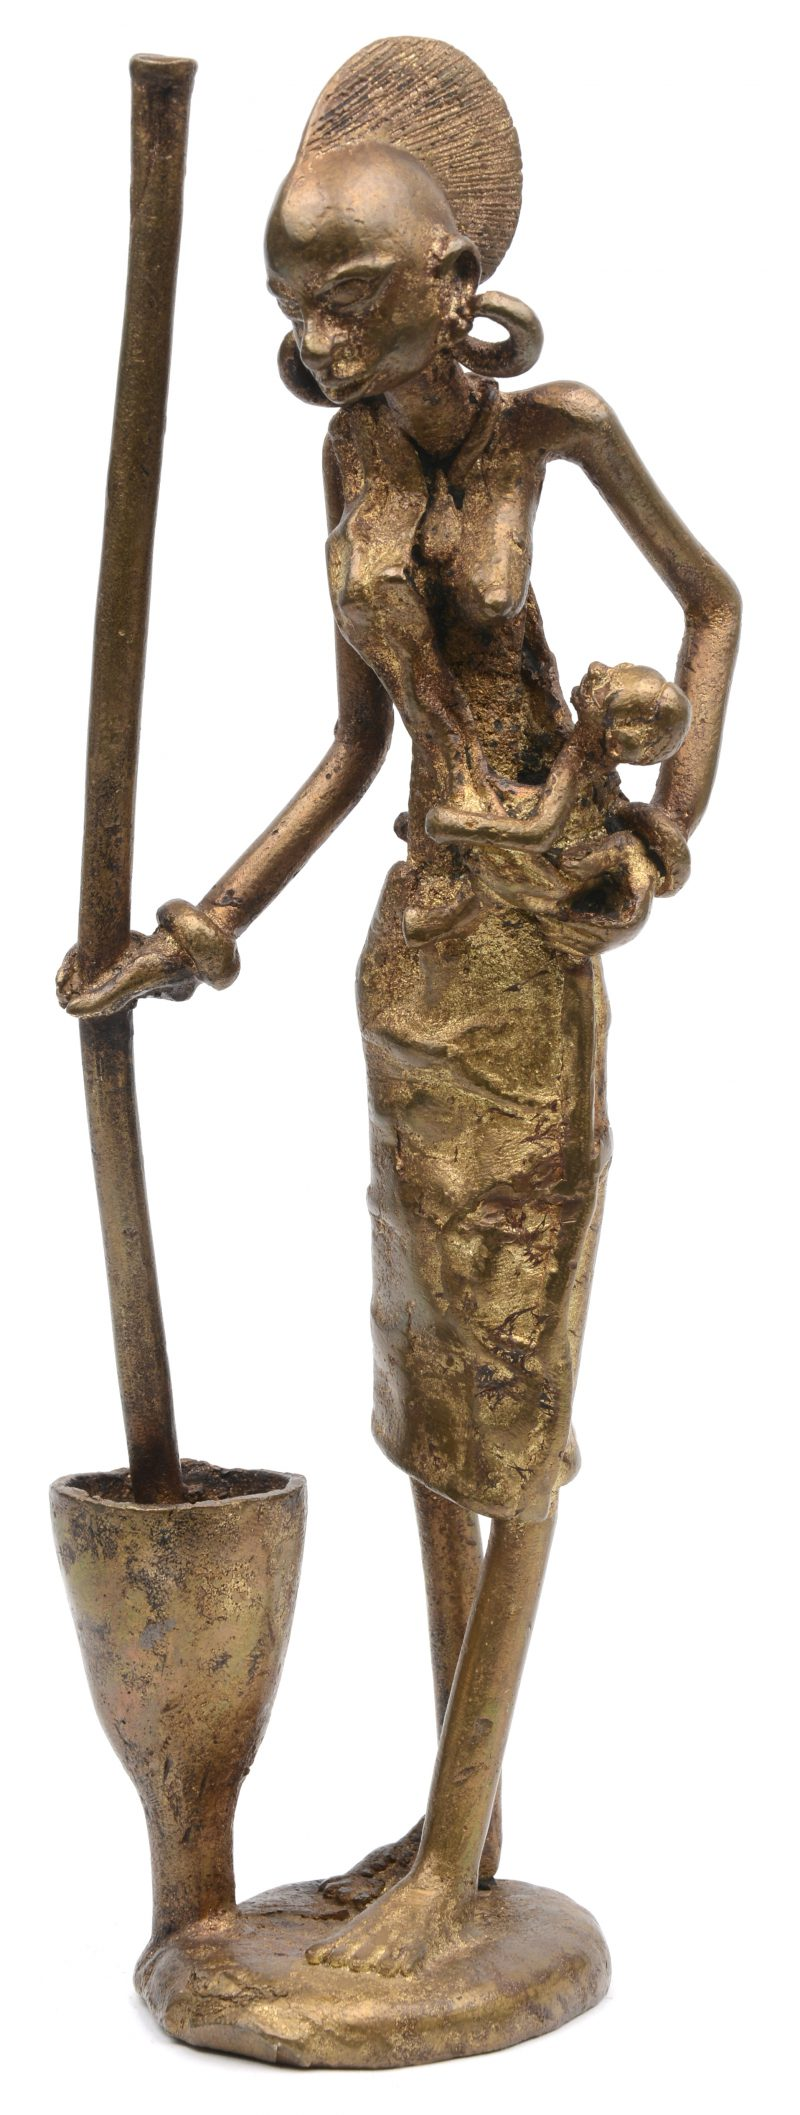 Maniokstampende Afrikaanse vrouw met kind.